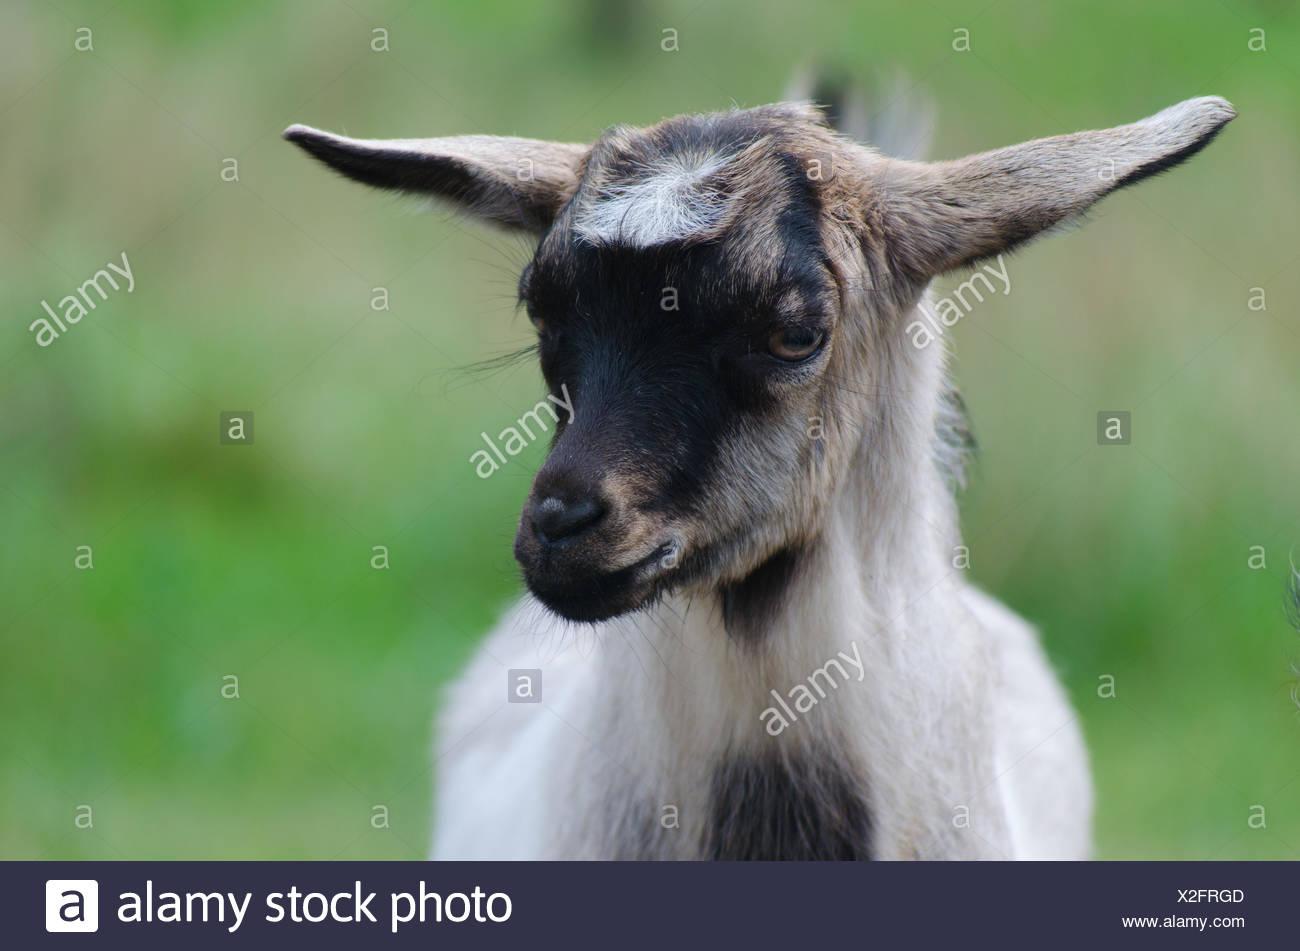 A portret of funny black-white goat kid - Stock Image